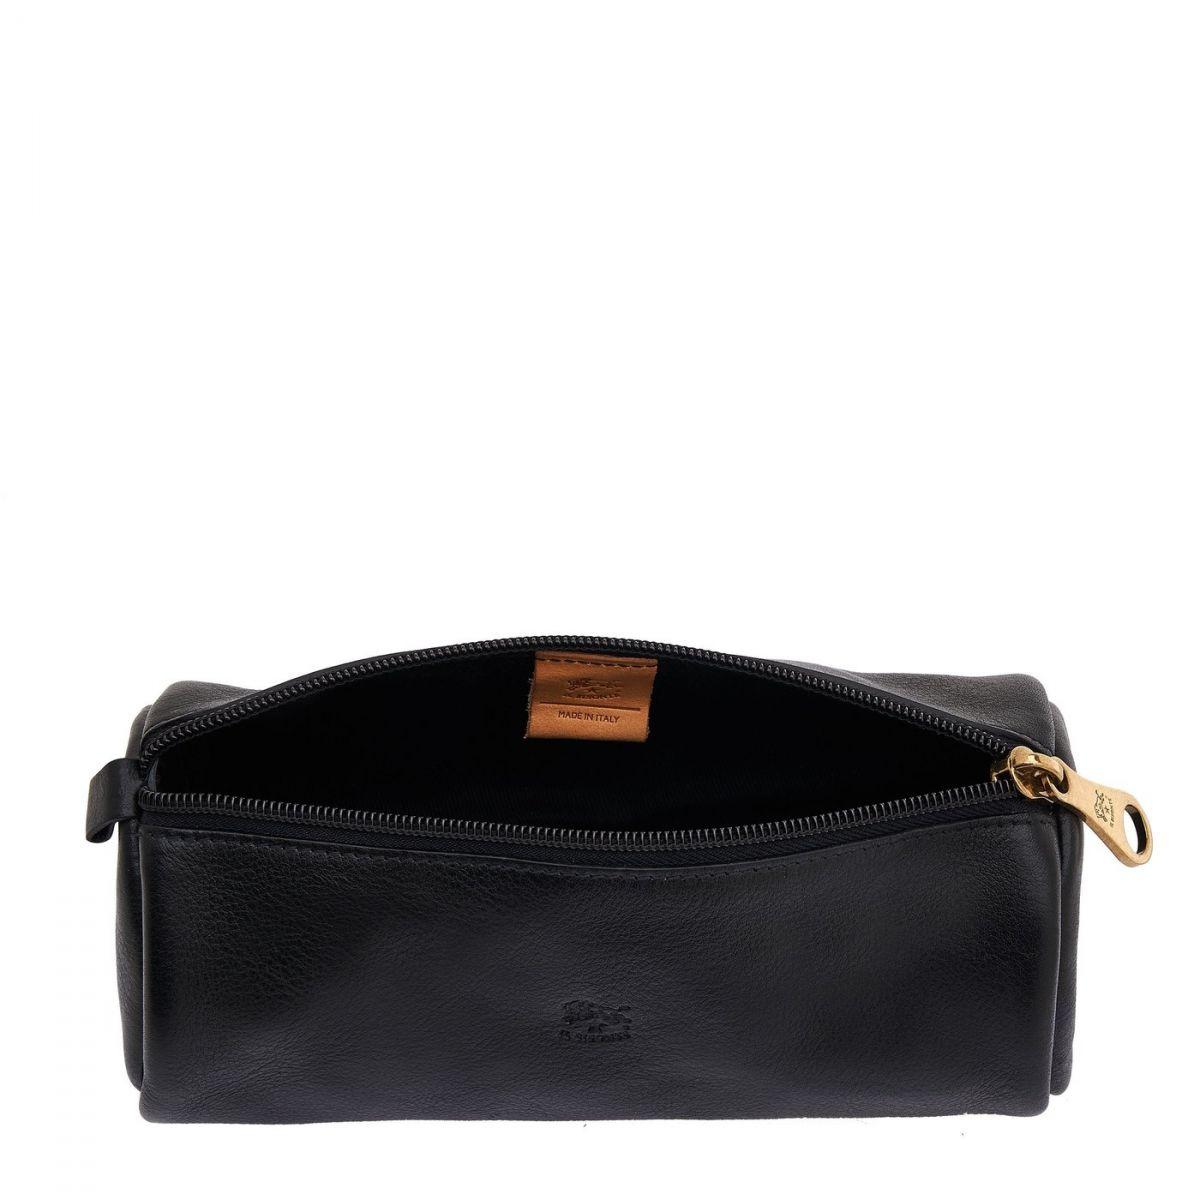 Case  in Cowhide Leather SCA049 color Black | Details